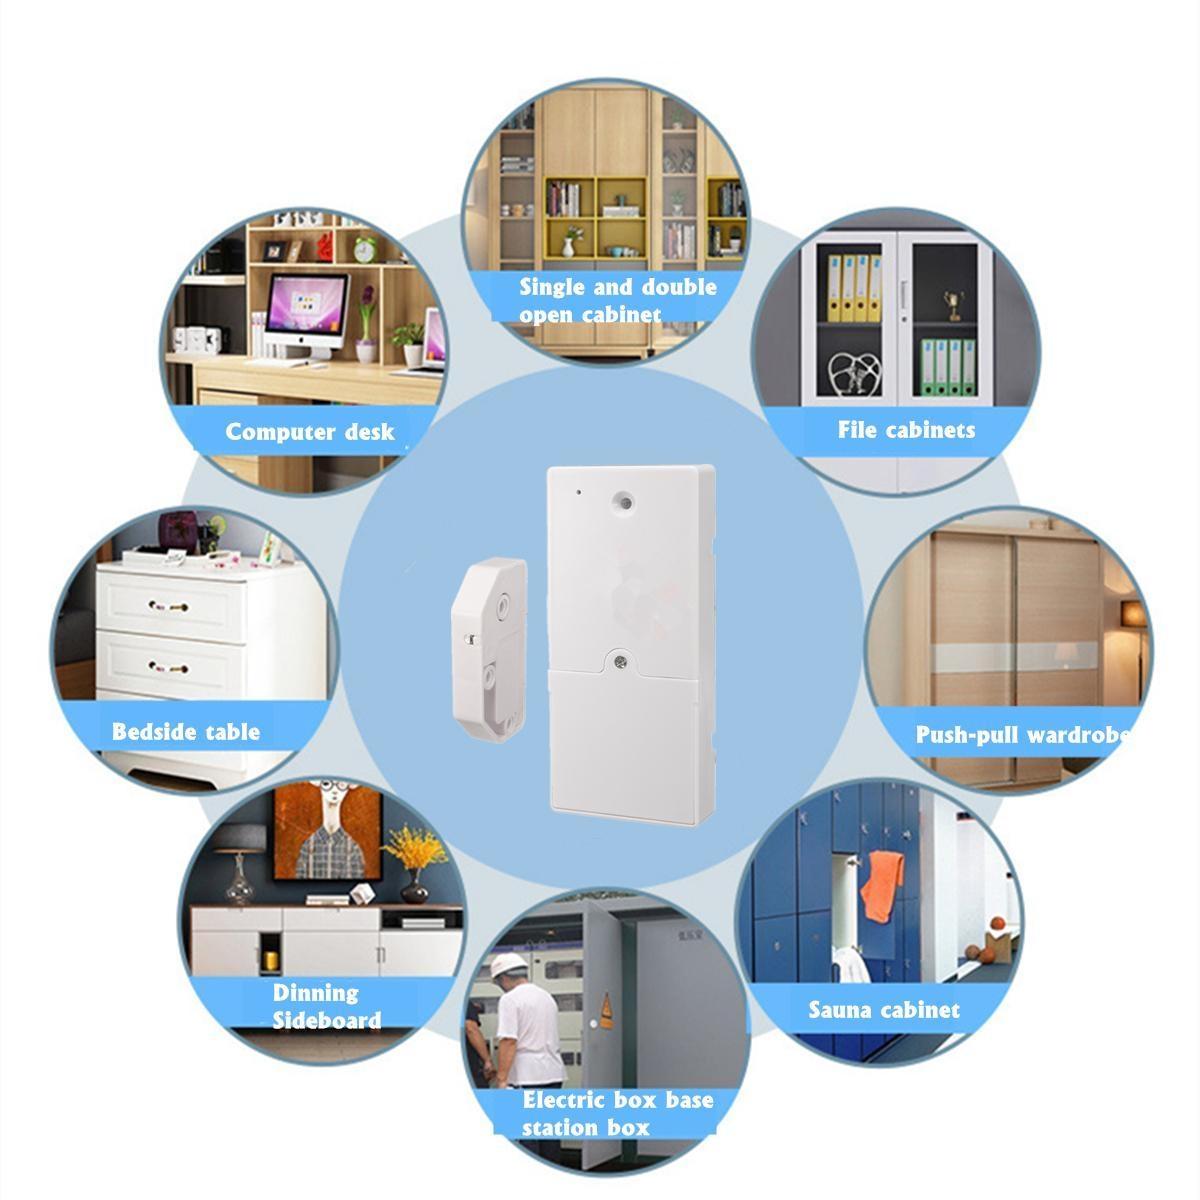 Buy Generic Bluetooth Electronic Cabinet Drawer Lock Hidden Digital Download Image Double Sink Vanity Plumbing Diagram Pc Android Iphone